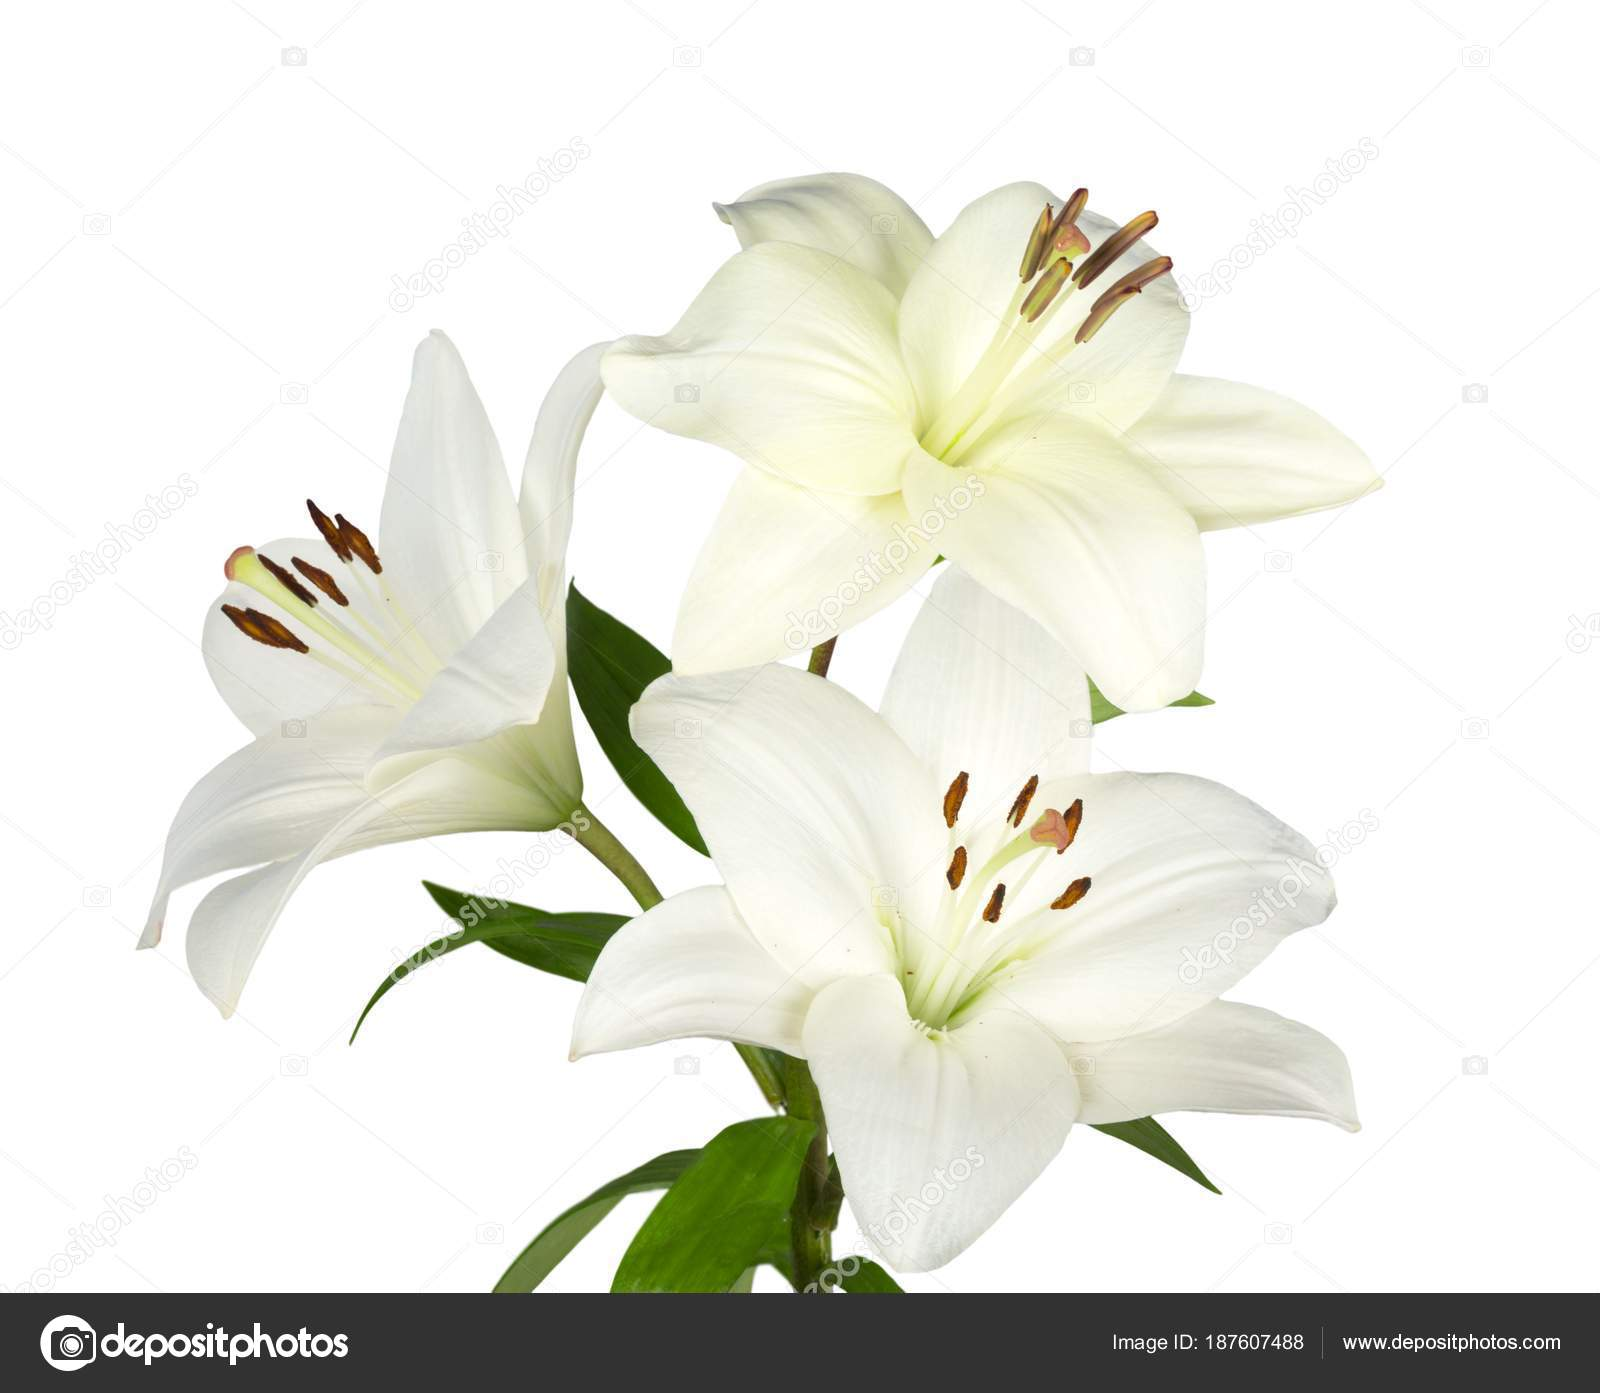 Beautiful white lilies flowers isolated white background stock beautiful white lilies flowers isolated on white background photo by billiondigital izmirmasajfo